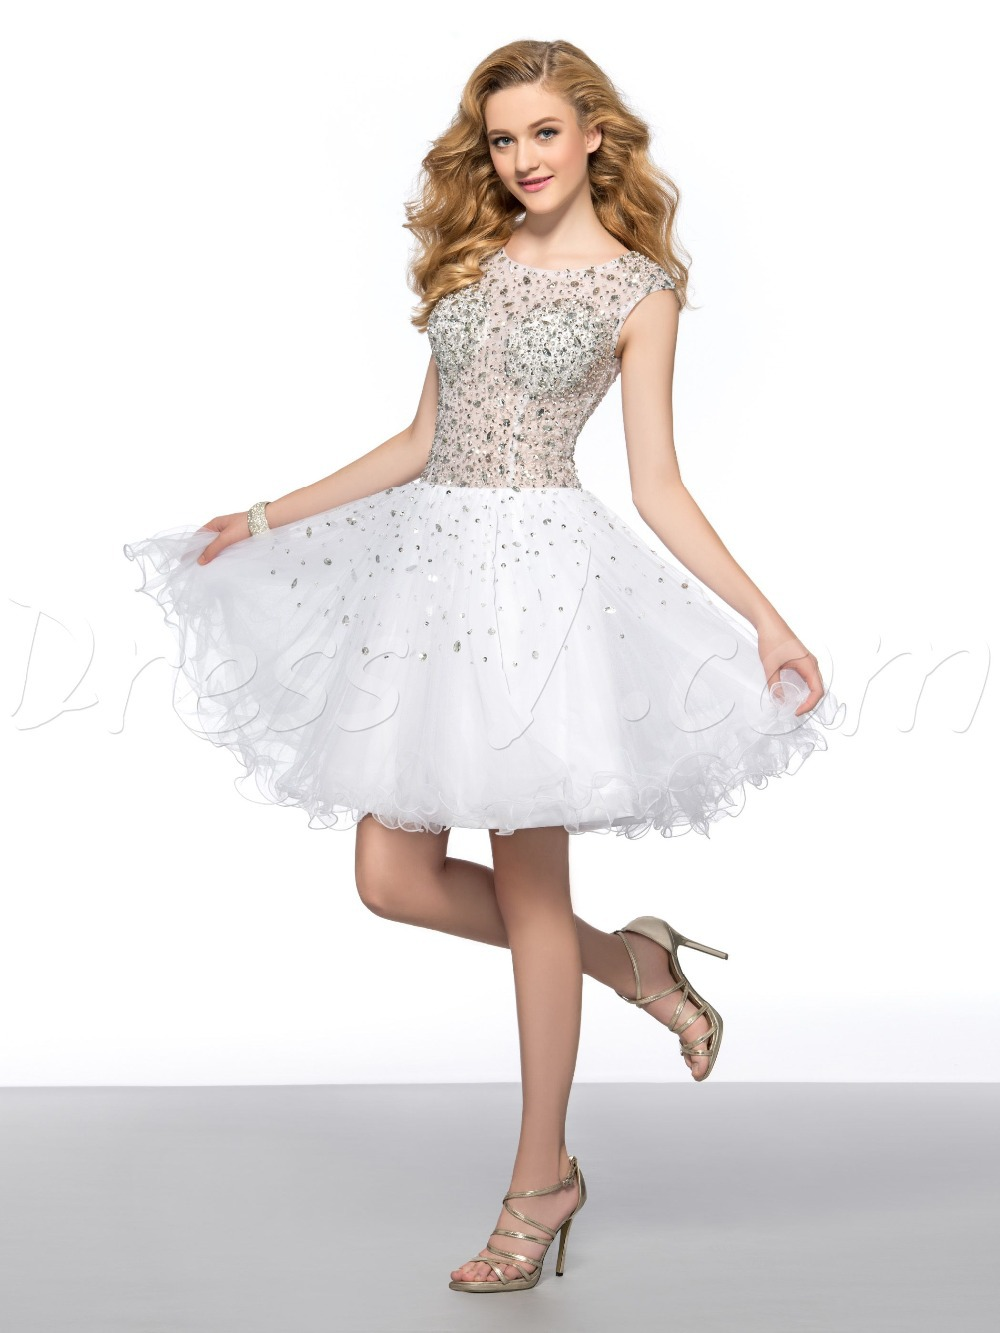 Dazzling Short White Cocktail Dresses Homecoming Dresses Scoop Sheer ...